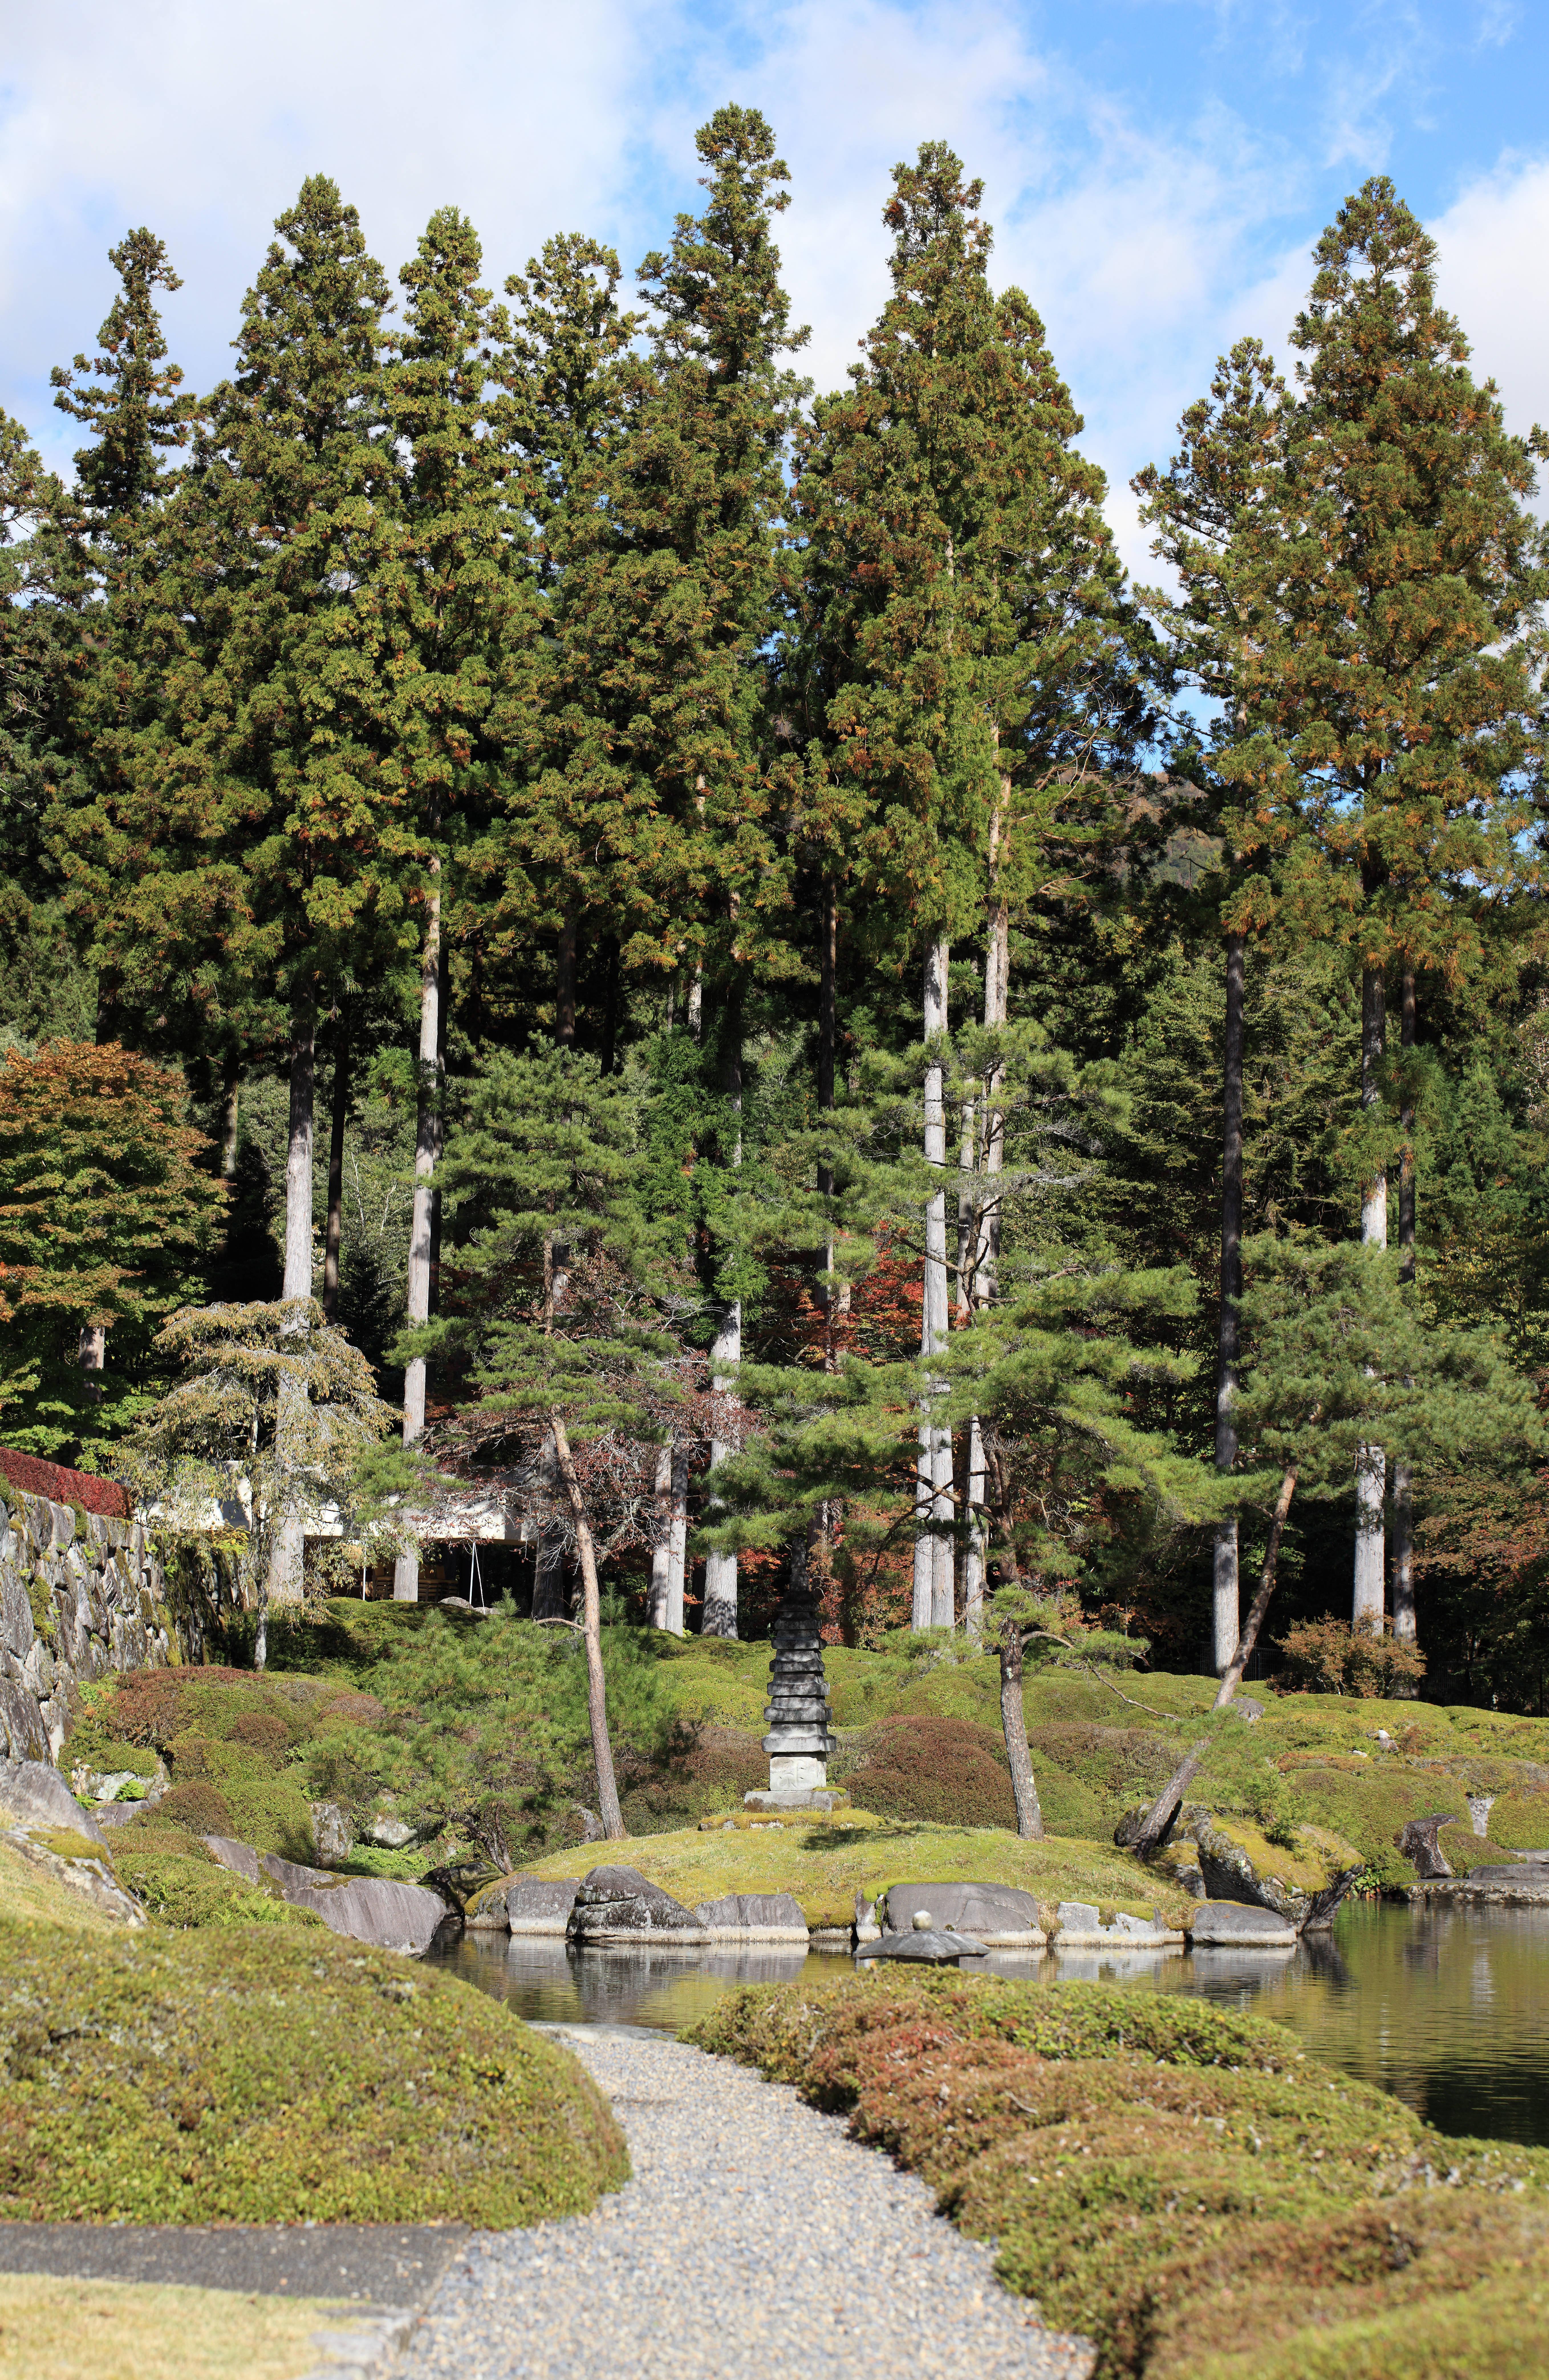 Free Images : tree, panorama, pond, high, autumn, botany, garden ...